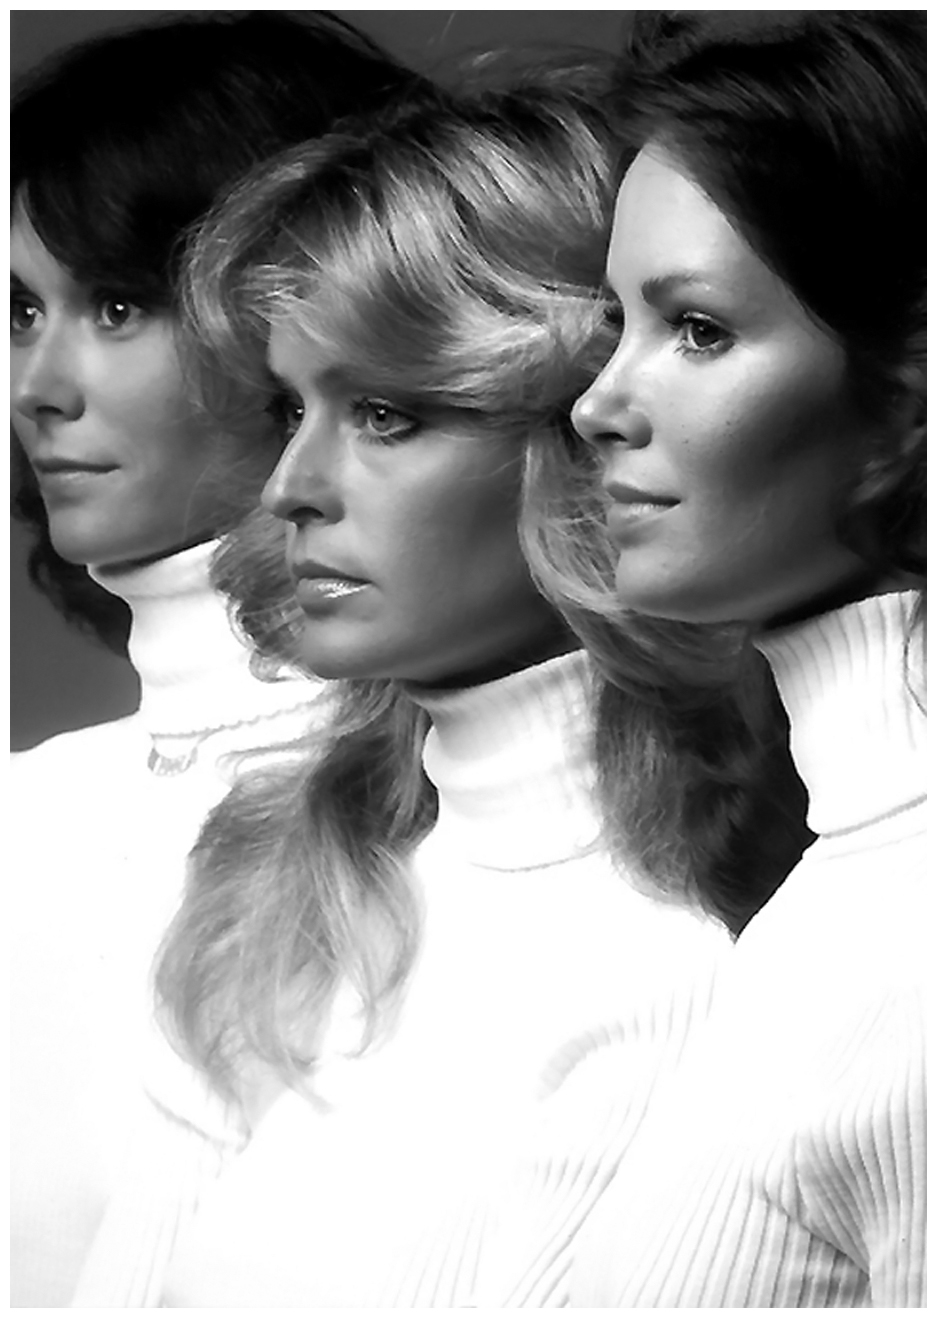 Farrah Fawcett, Kate Jackson and Jaclyn Smith of Charlie's Angels ...